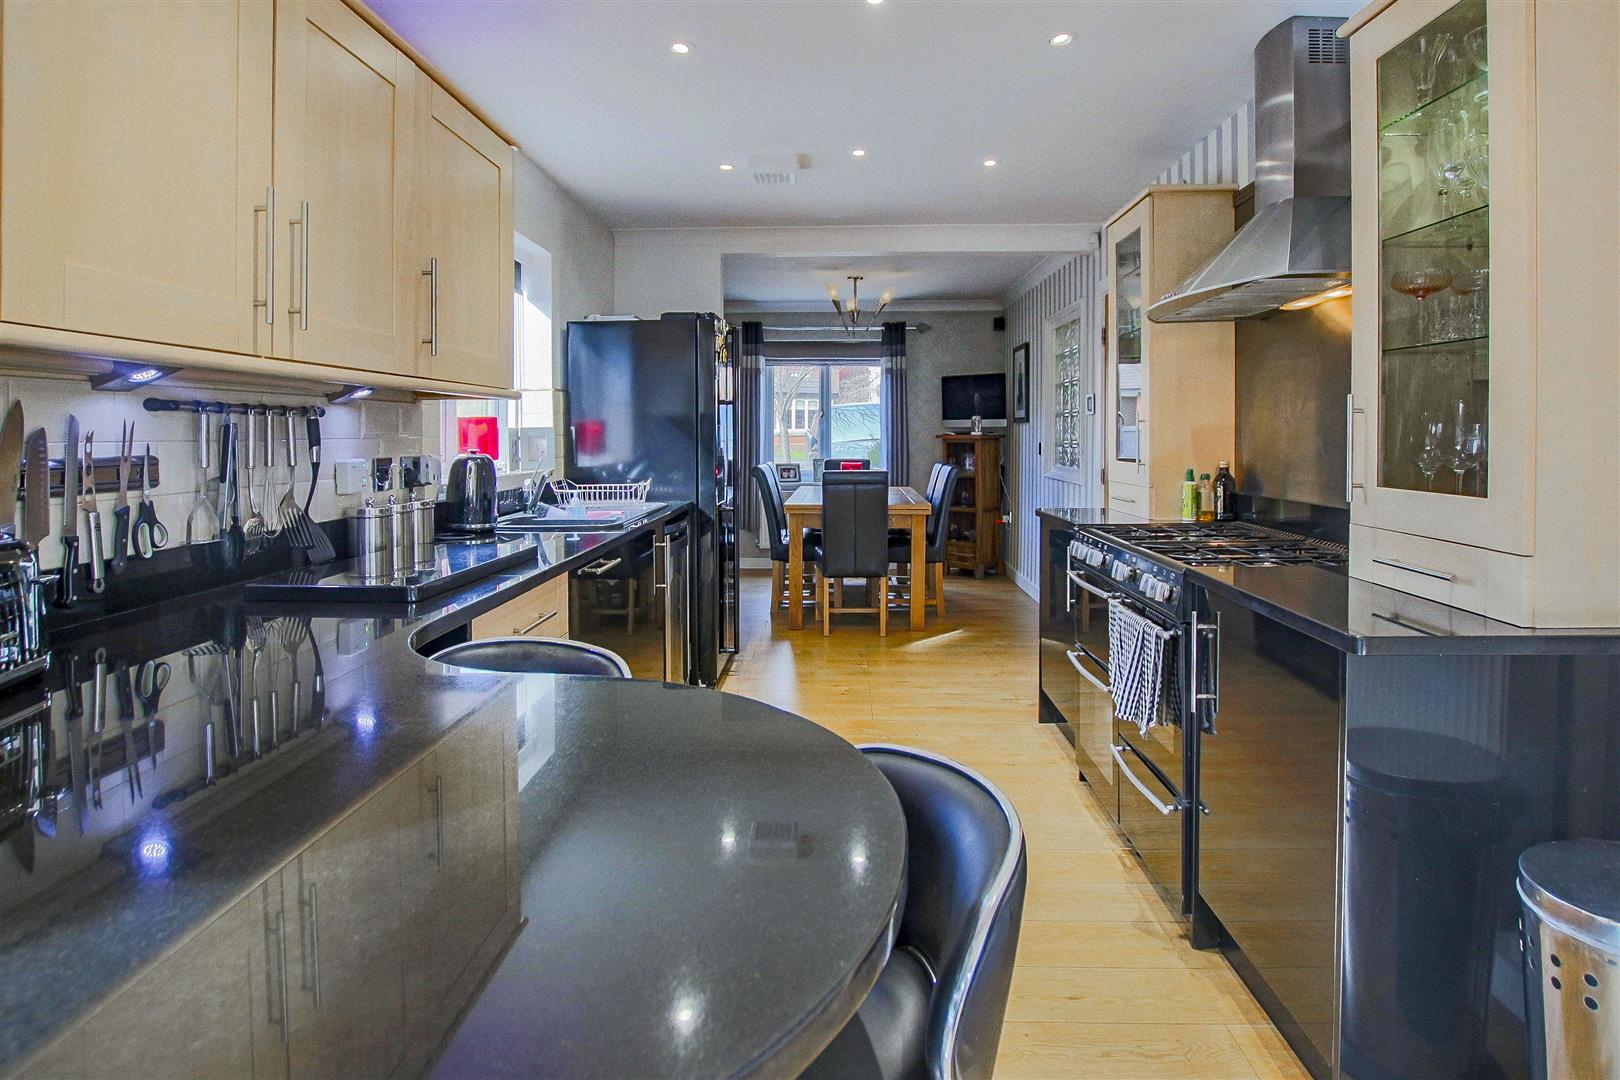 4 Bedroom Detached House For Sale - redwing31755.JPG